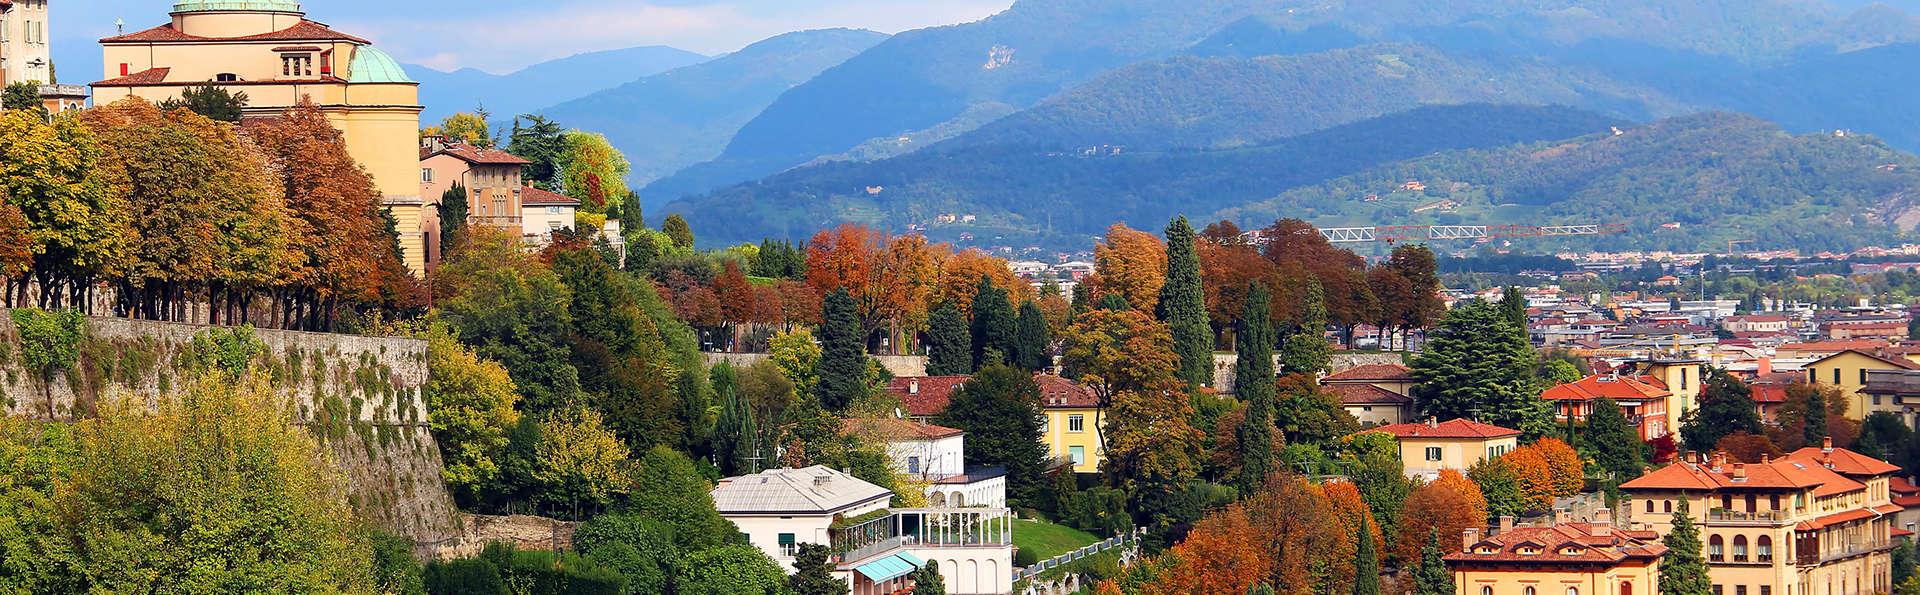 Hotel Terme San Pancrazio - Edit_Bergamo3.jpg